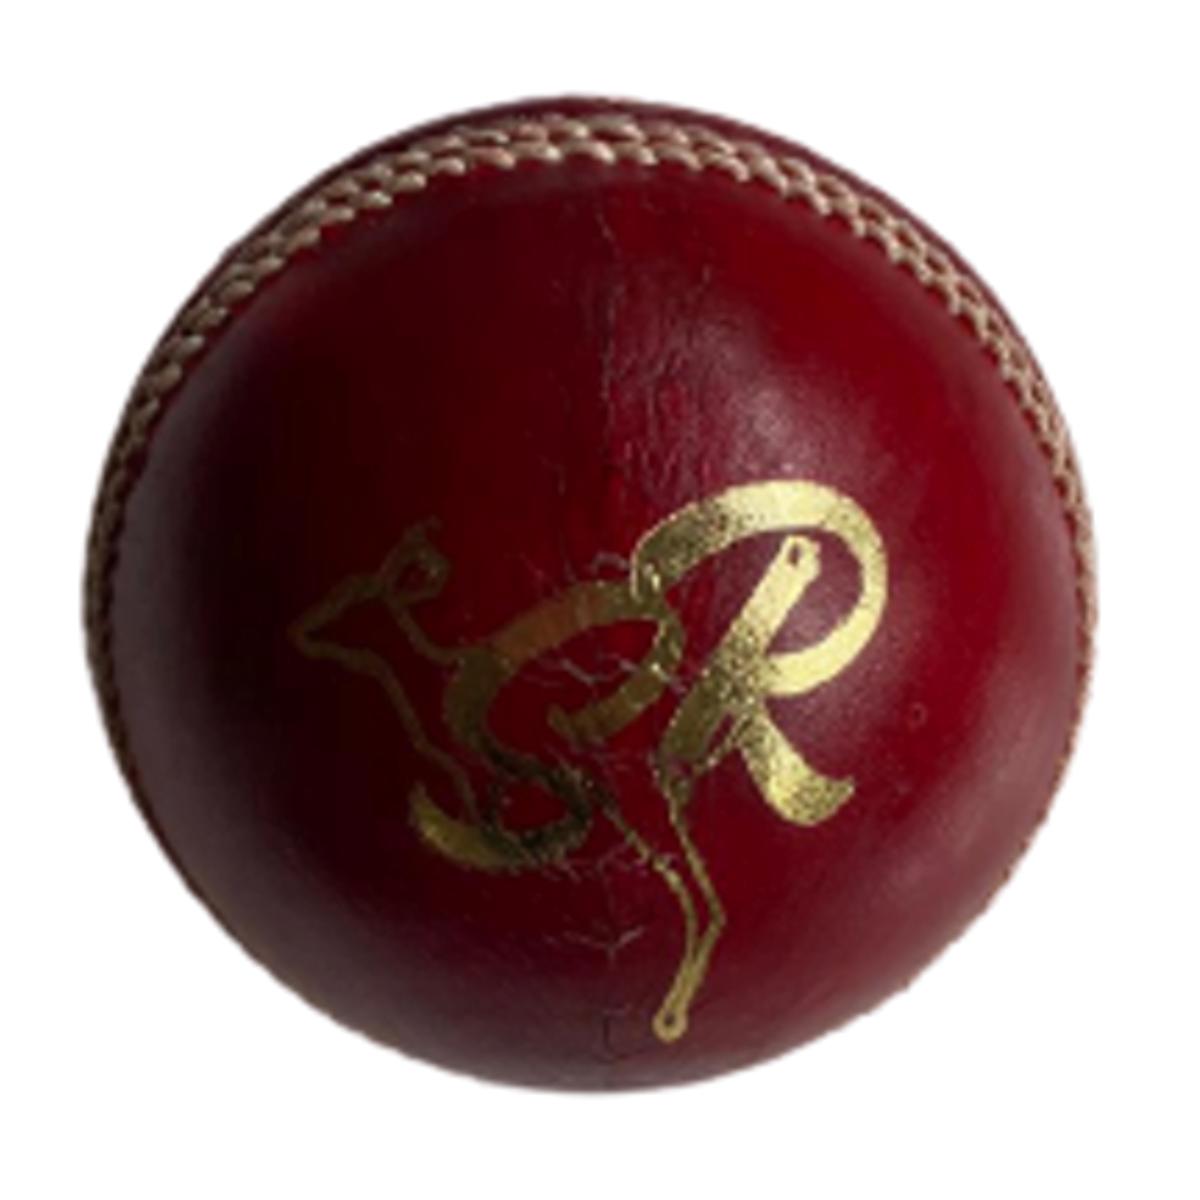 SR Test Leather Ball 4 Piece